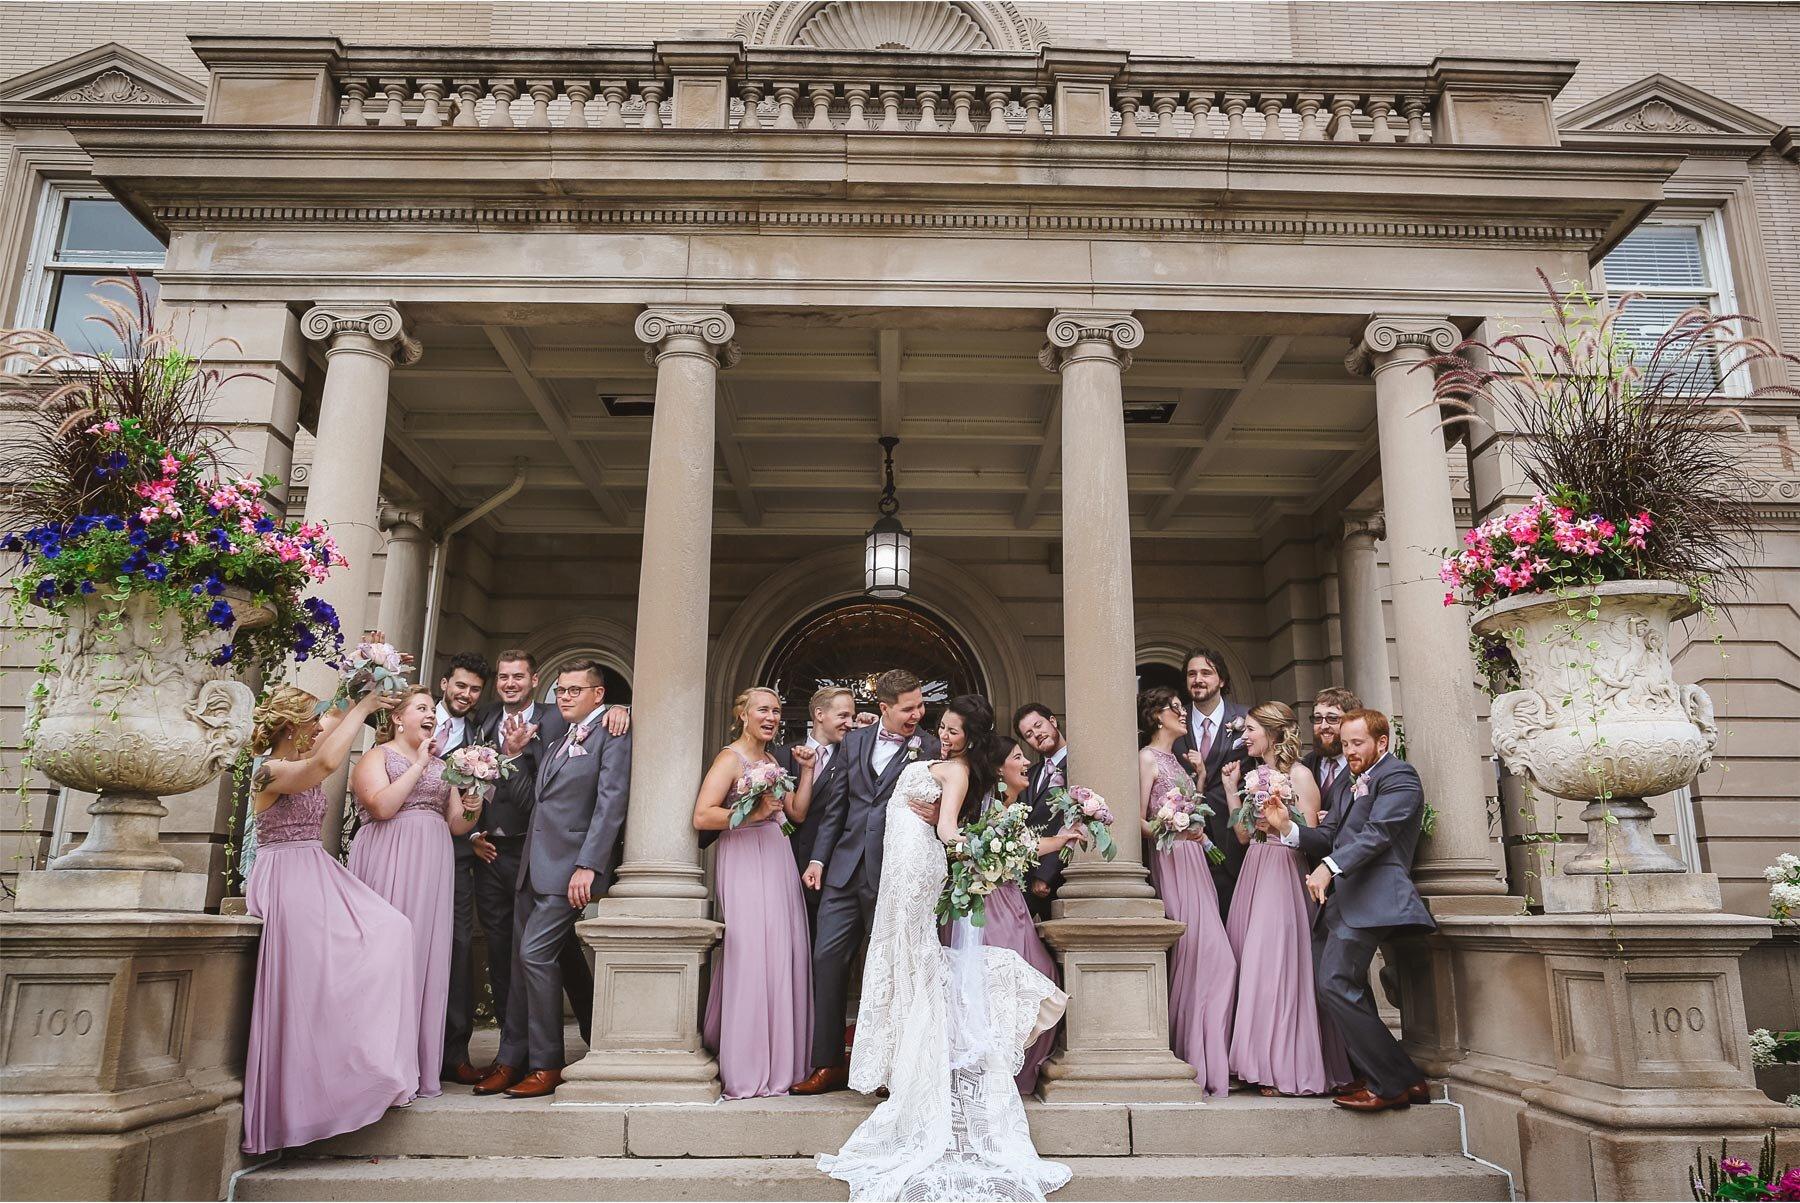 07-Wedding-by-Vick-Photography-Minneapolis-Minnesota-Semple-Mansion-Historic-Venue-Bridesmaids-Groomsmen-Kaitlyn-and-Nate.jpg